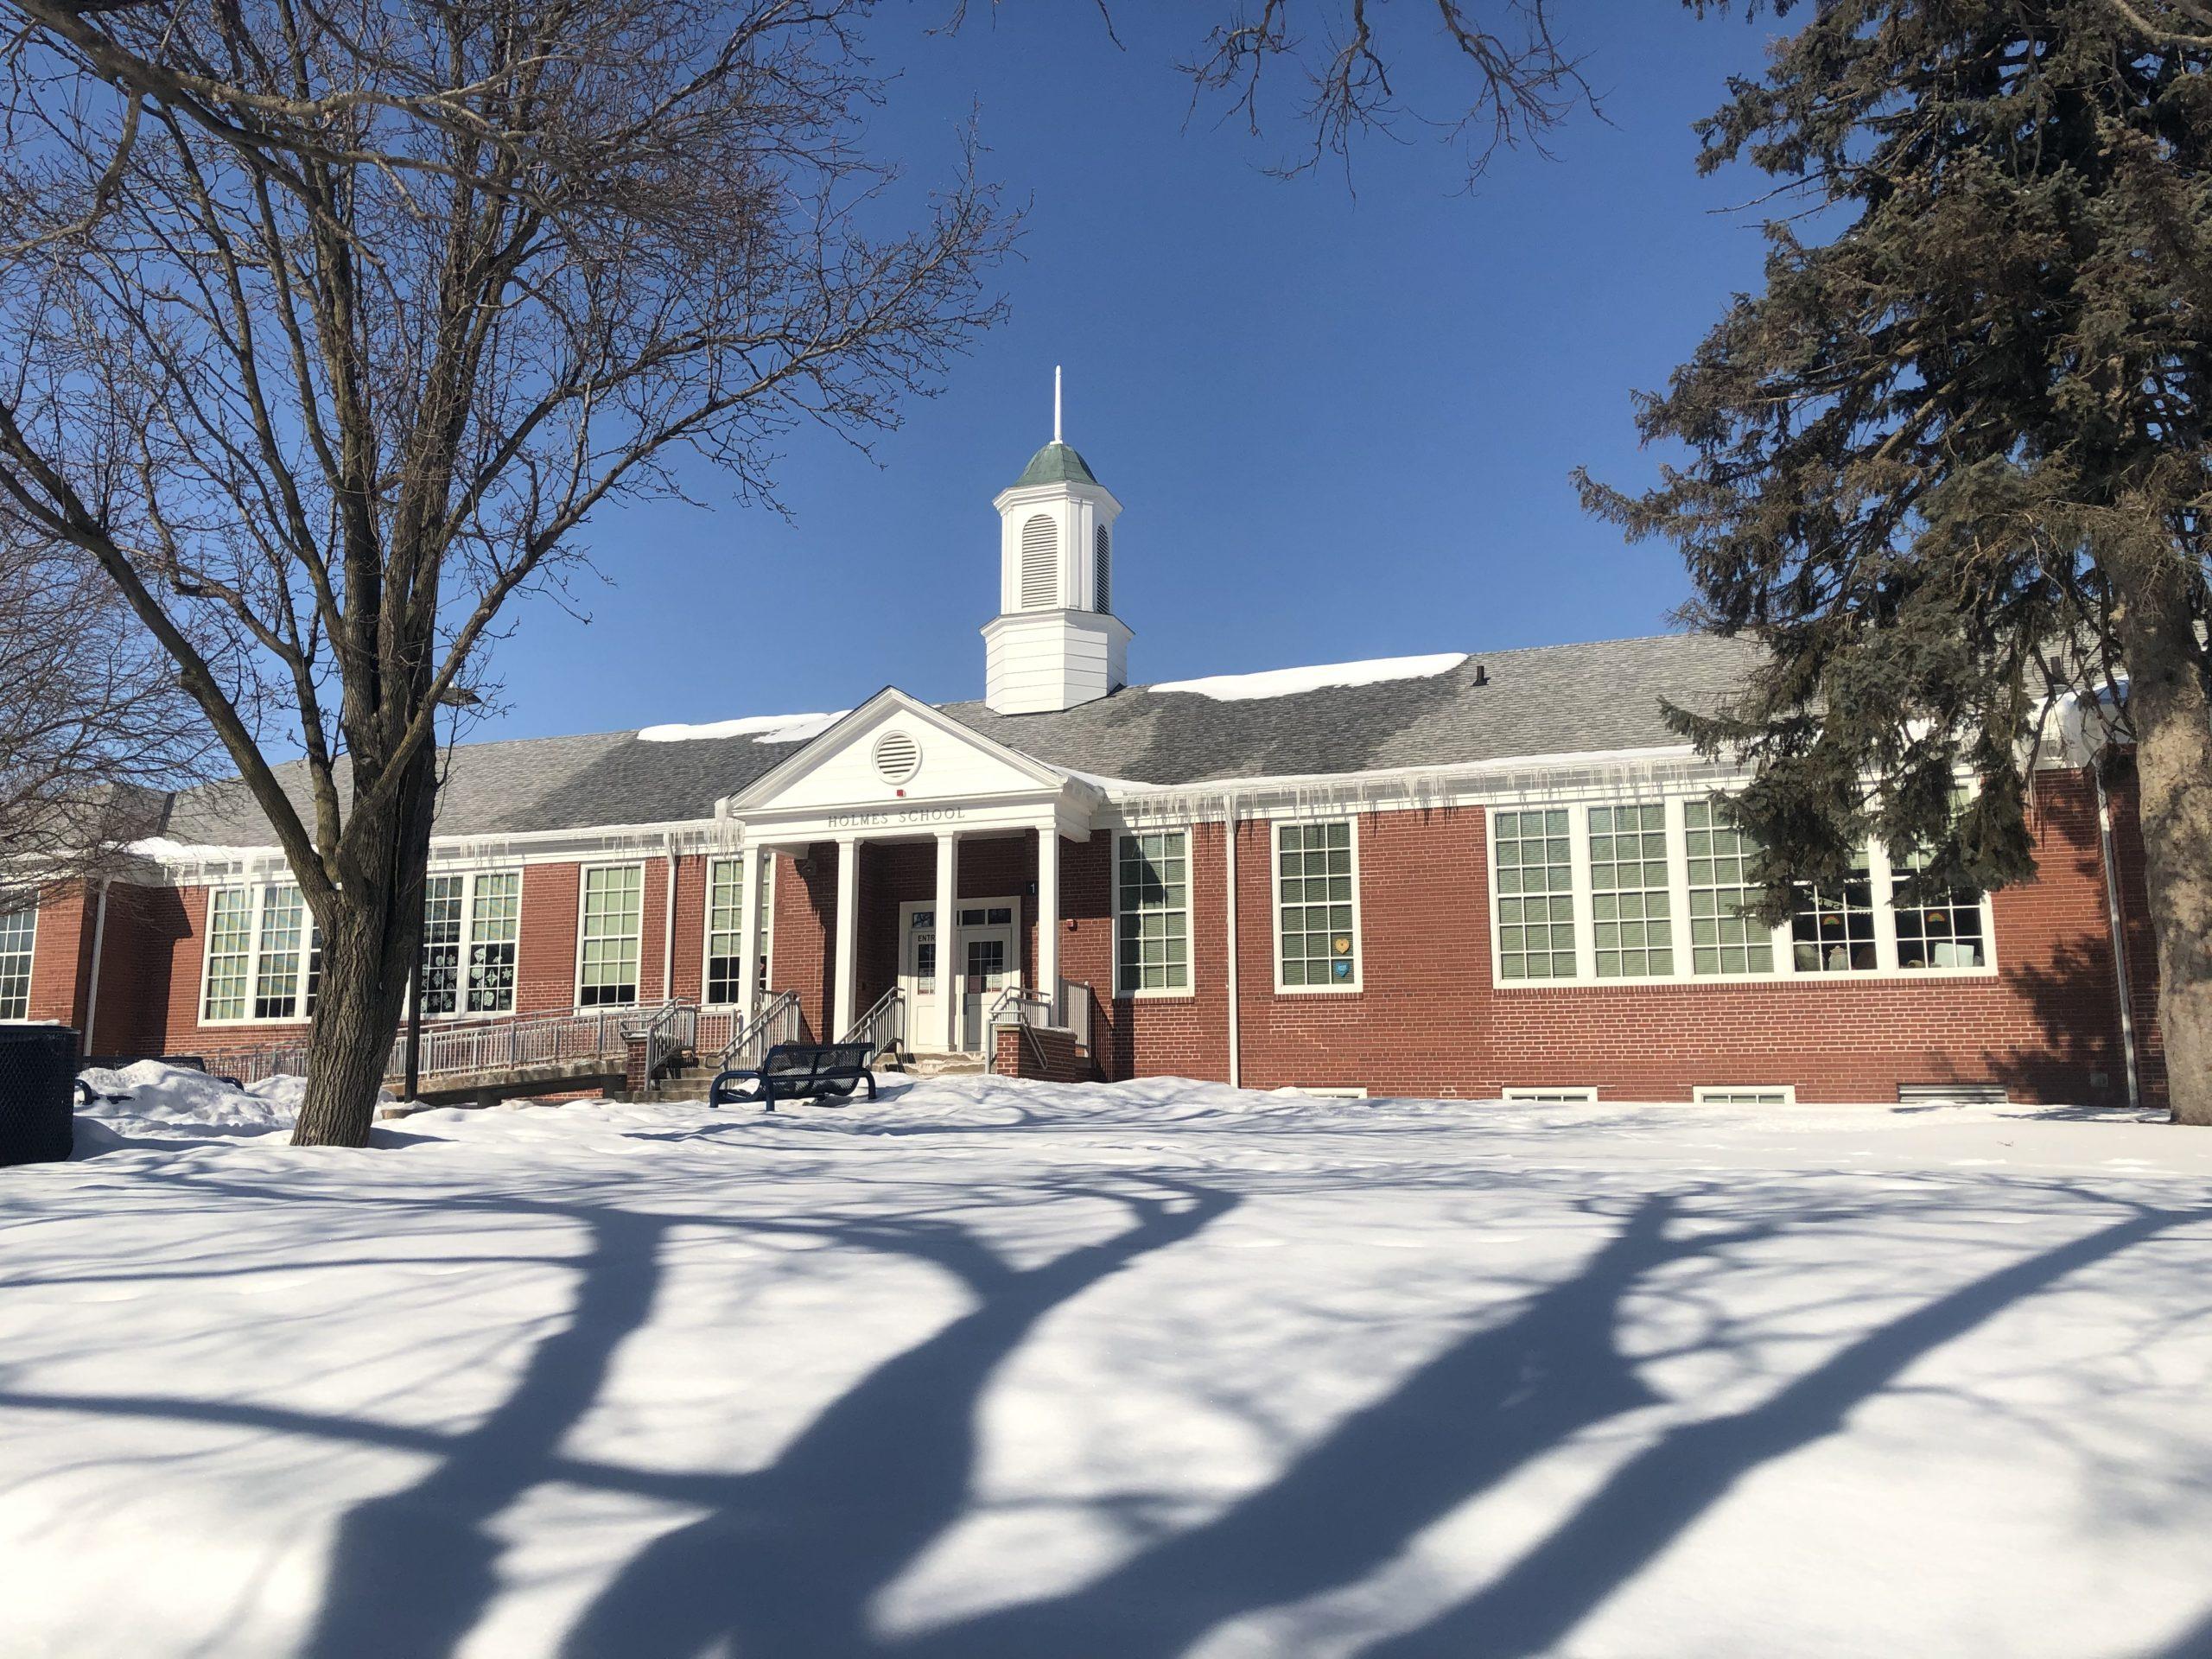 Holmes Elementary School in Lincoln, Nebraska.